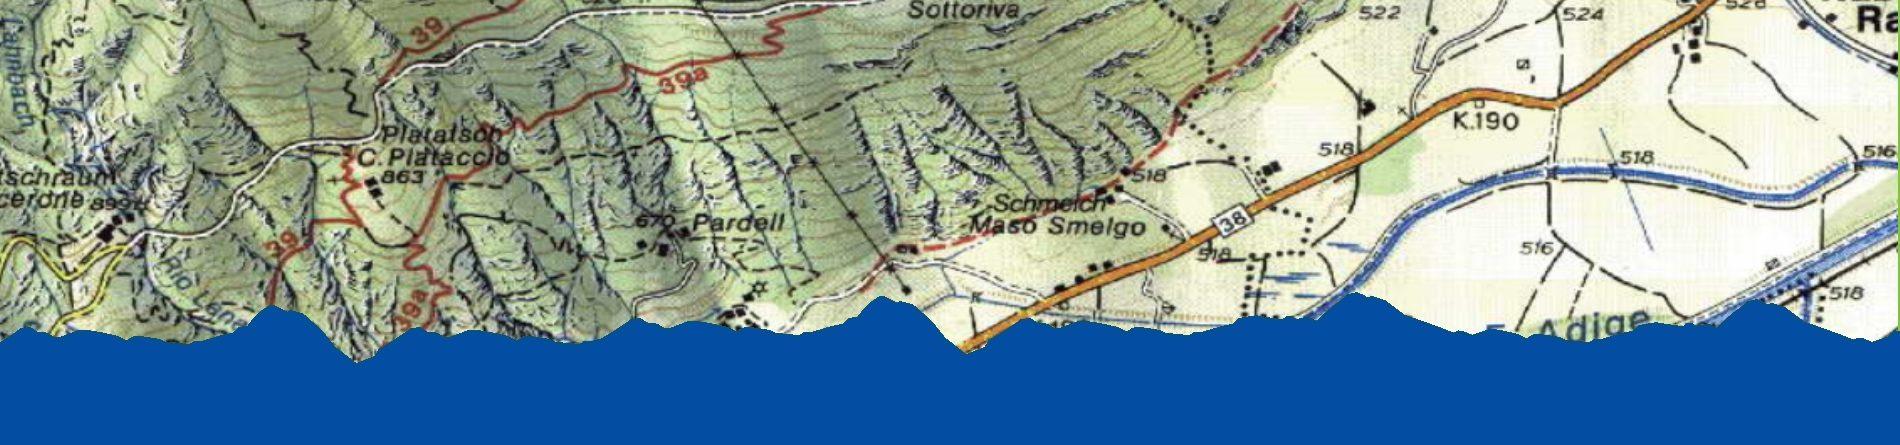 23.06.2021 – Suchaktion Zone Dorf Tirol